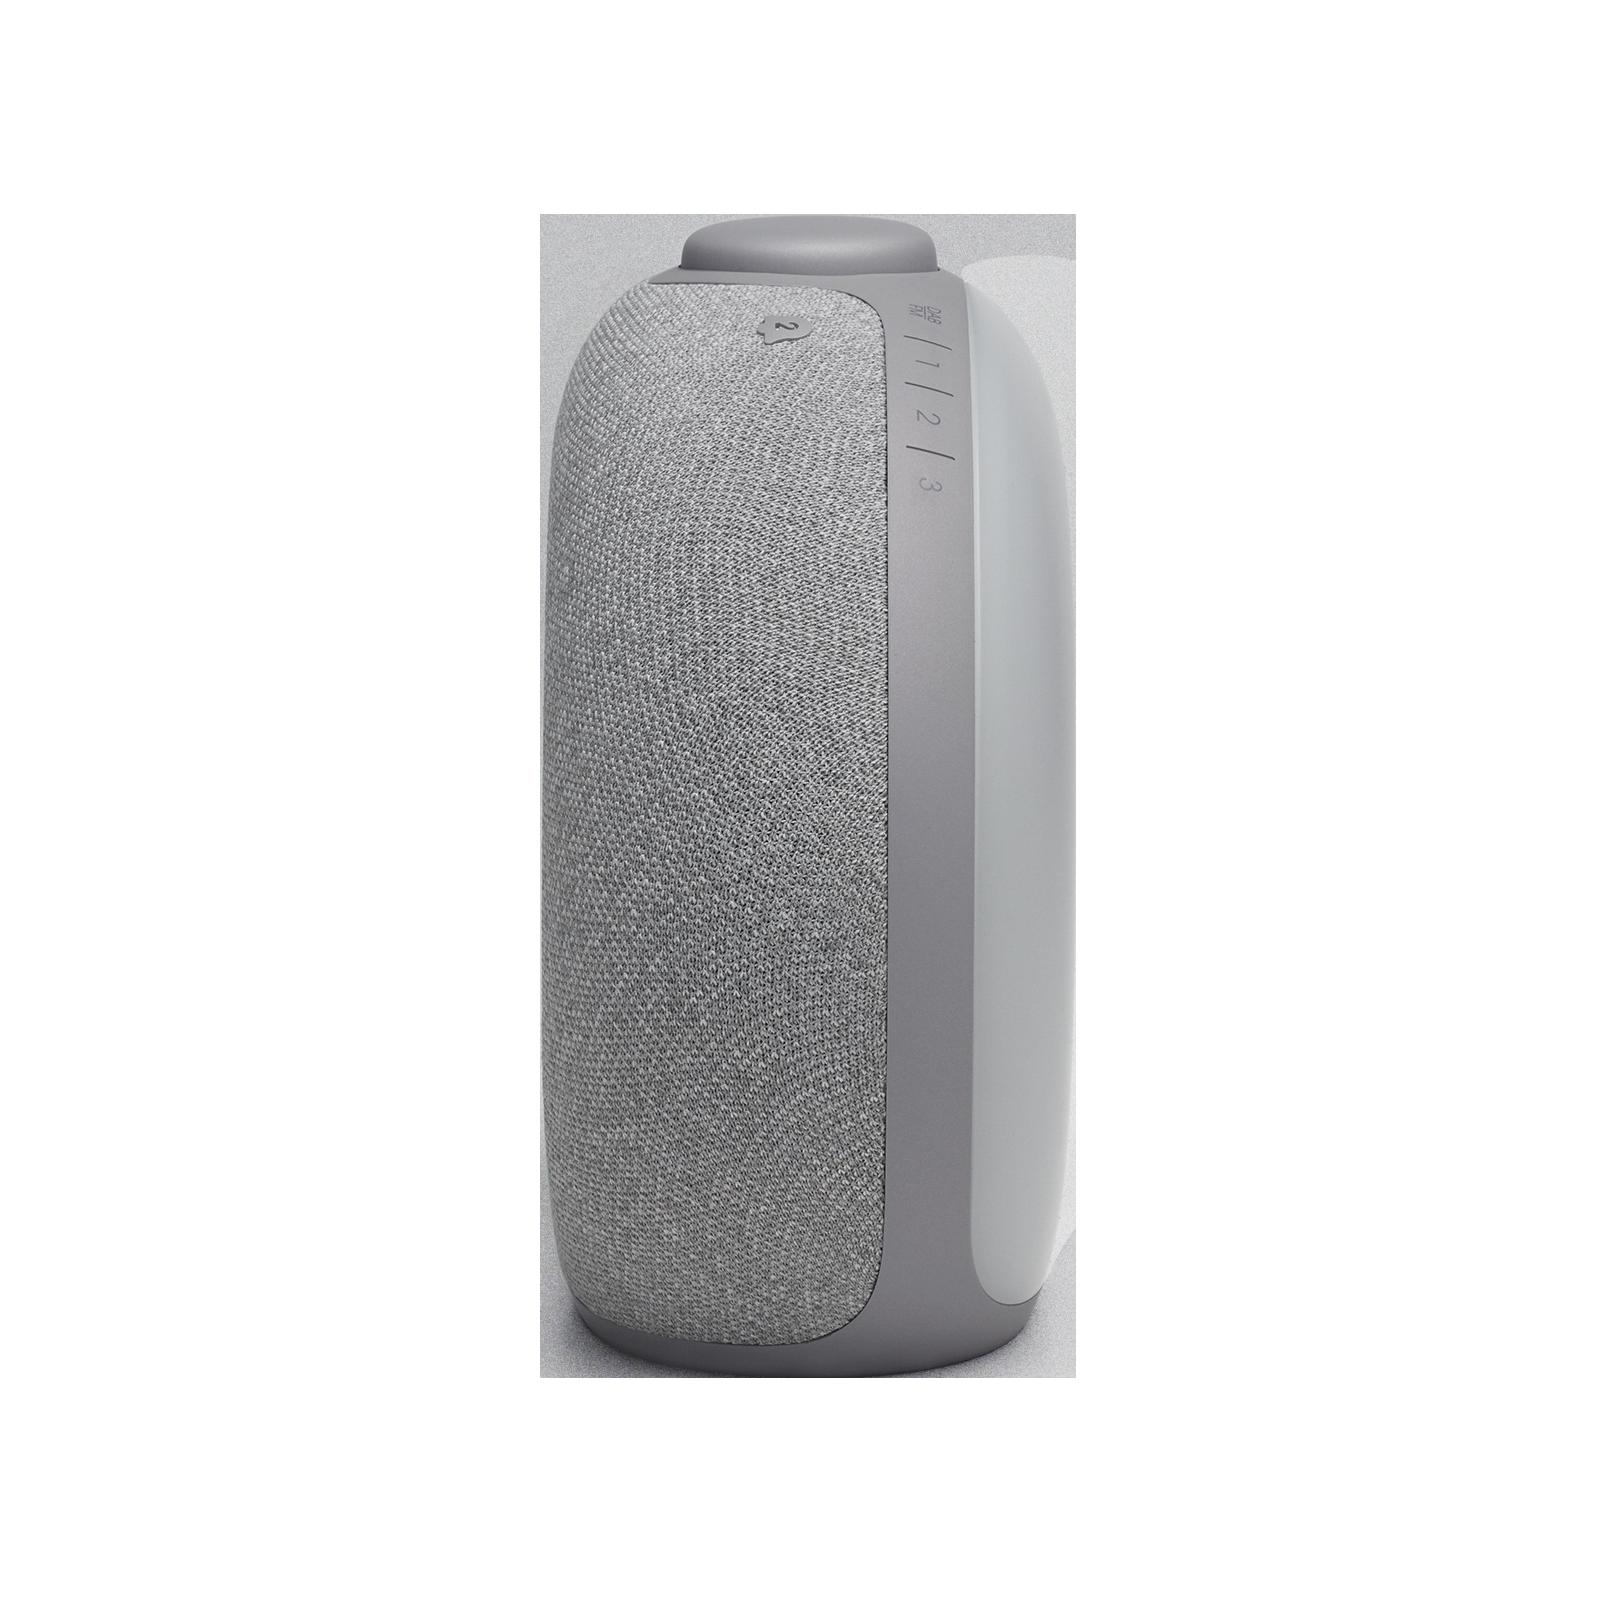 JBL Horizon 2 DAB - Grey - Bluetooth clock radio speaker with DAB/DAB+/FM - Left